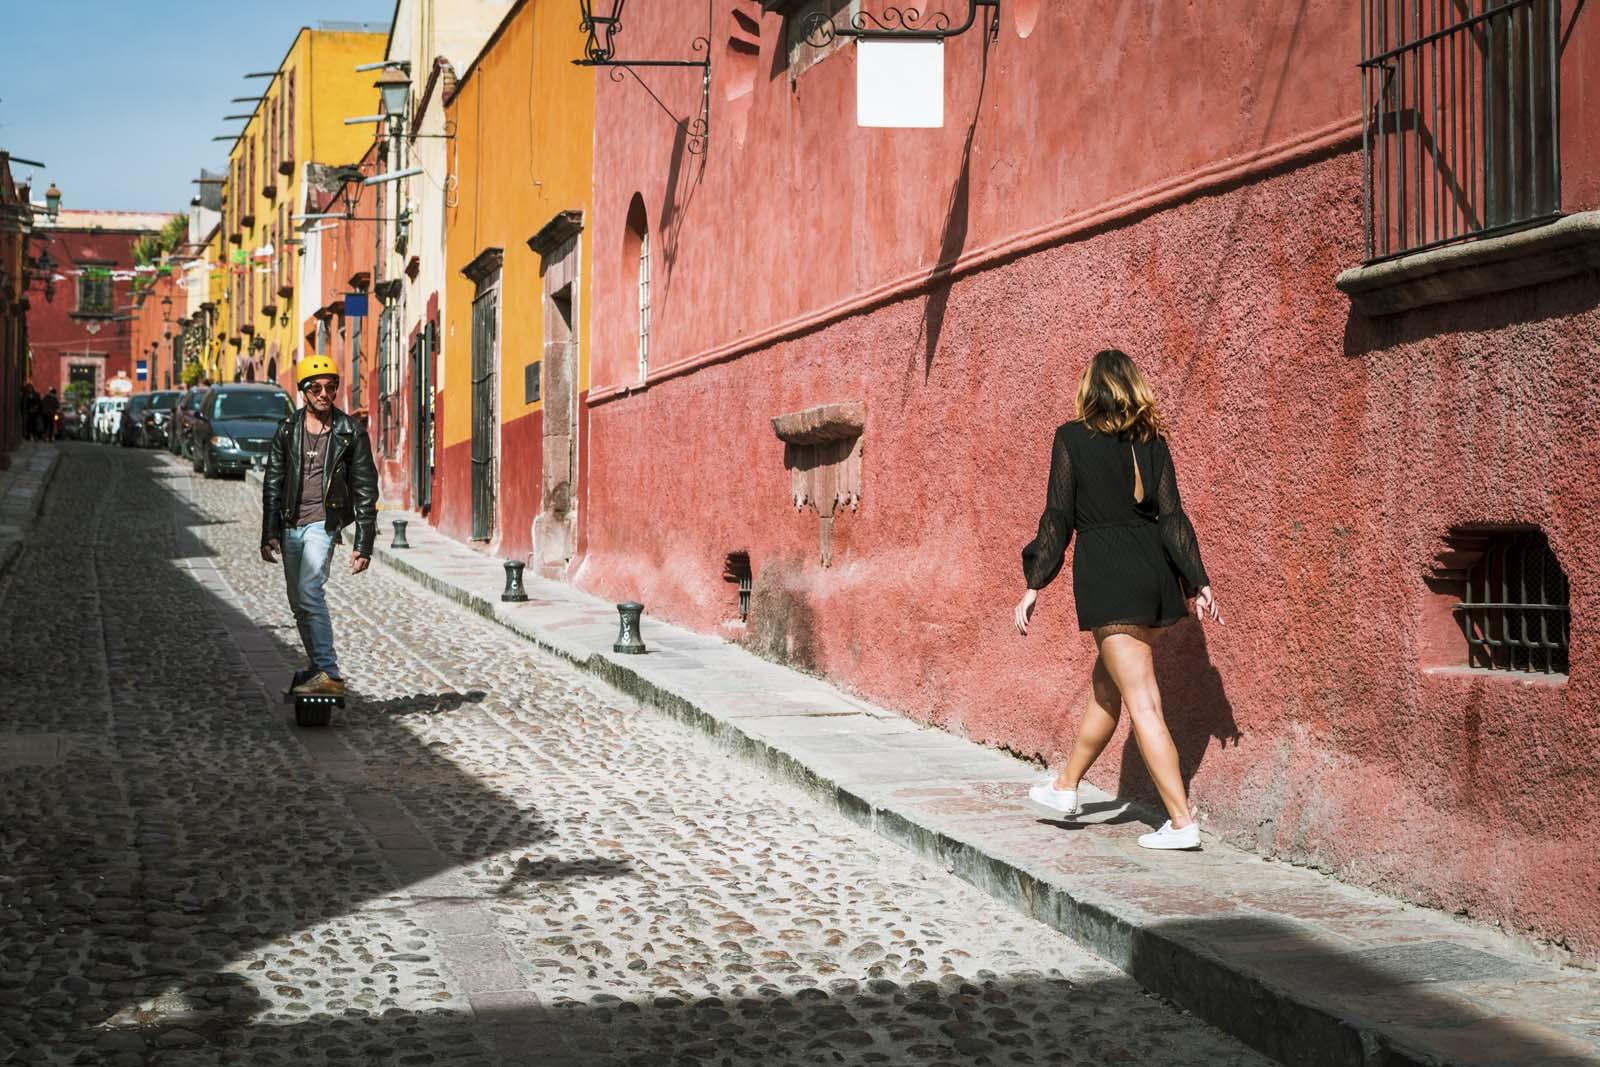 Skateboarder coming down cobblestone streets in San Miguel de Allende